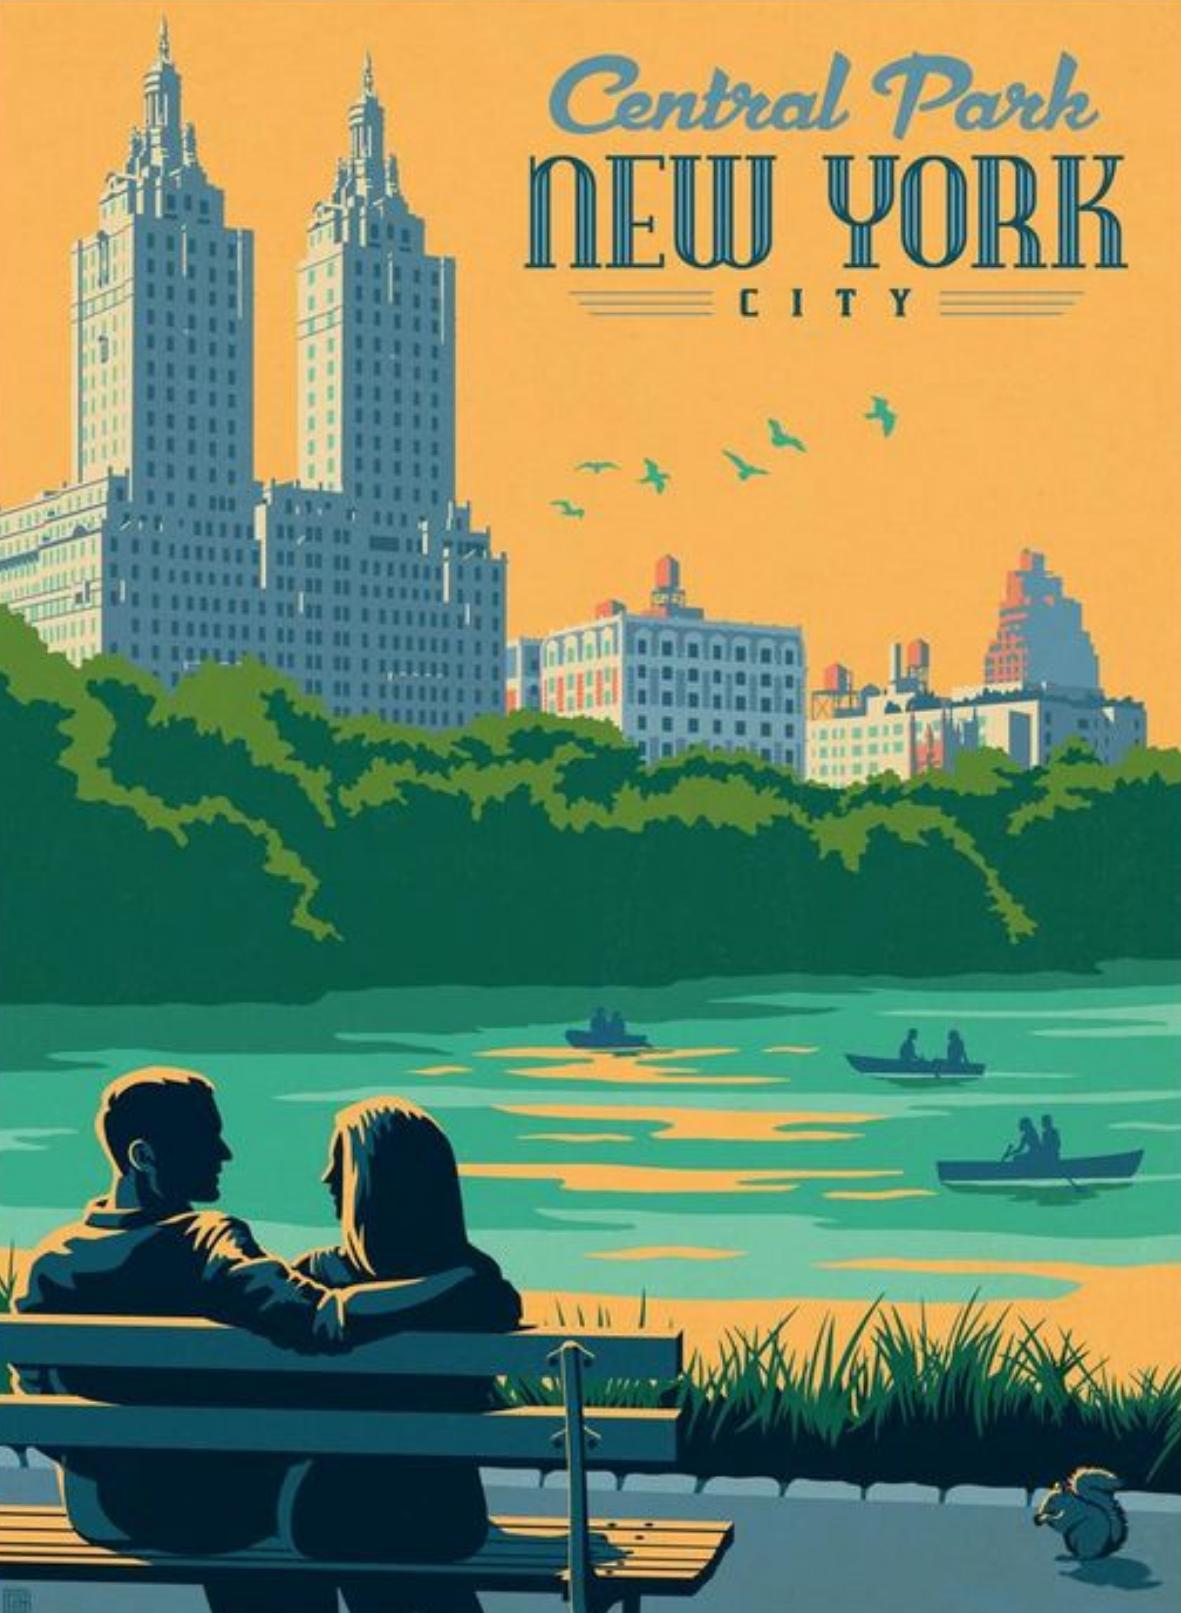 New York City New York New York Illustration Retro Travel Poster New York City Central Park